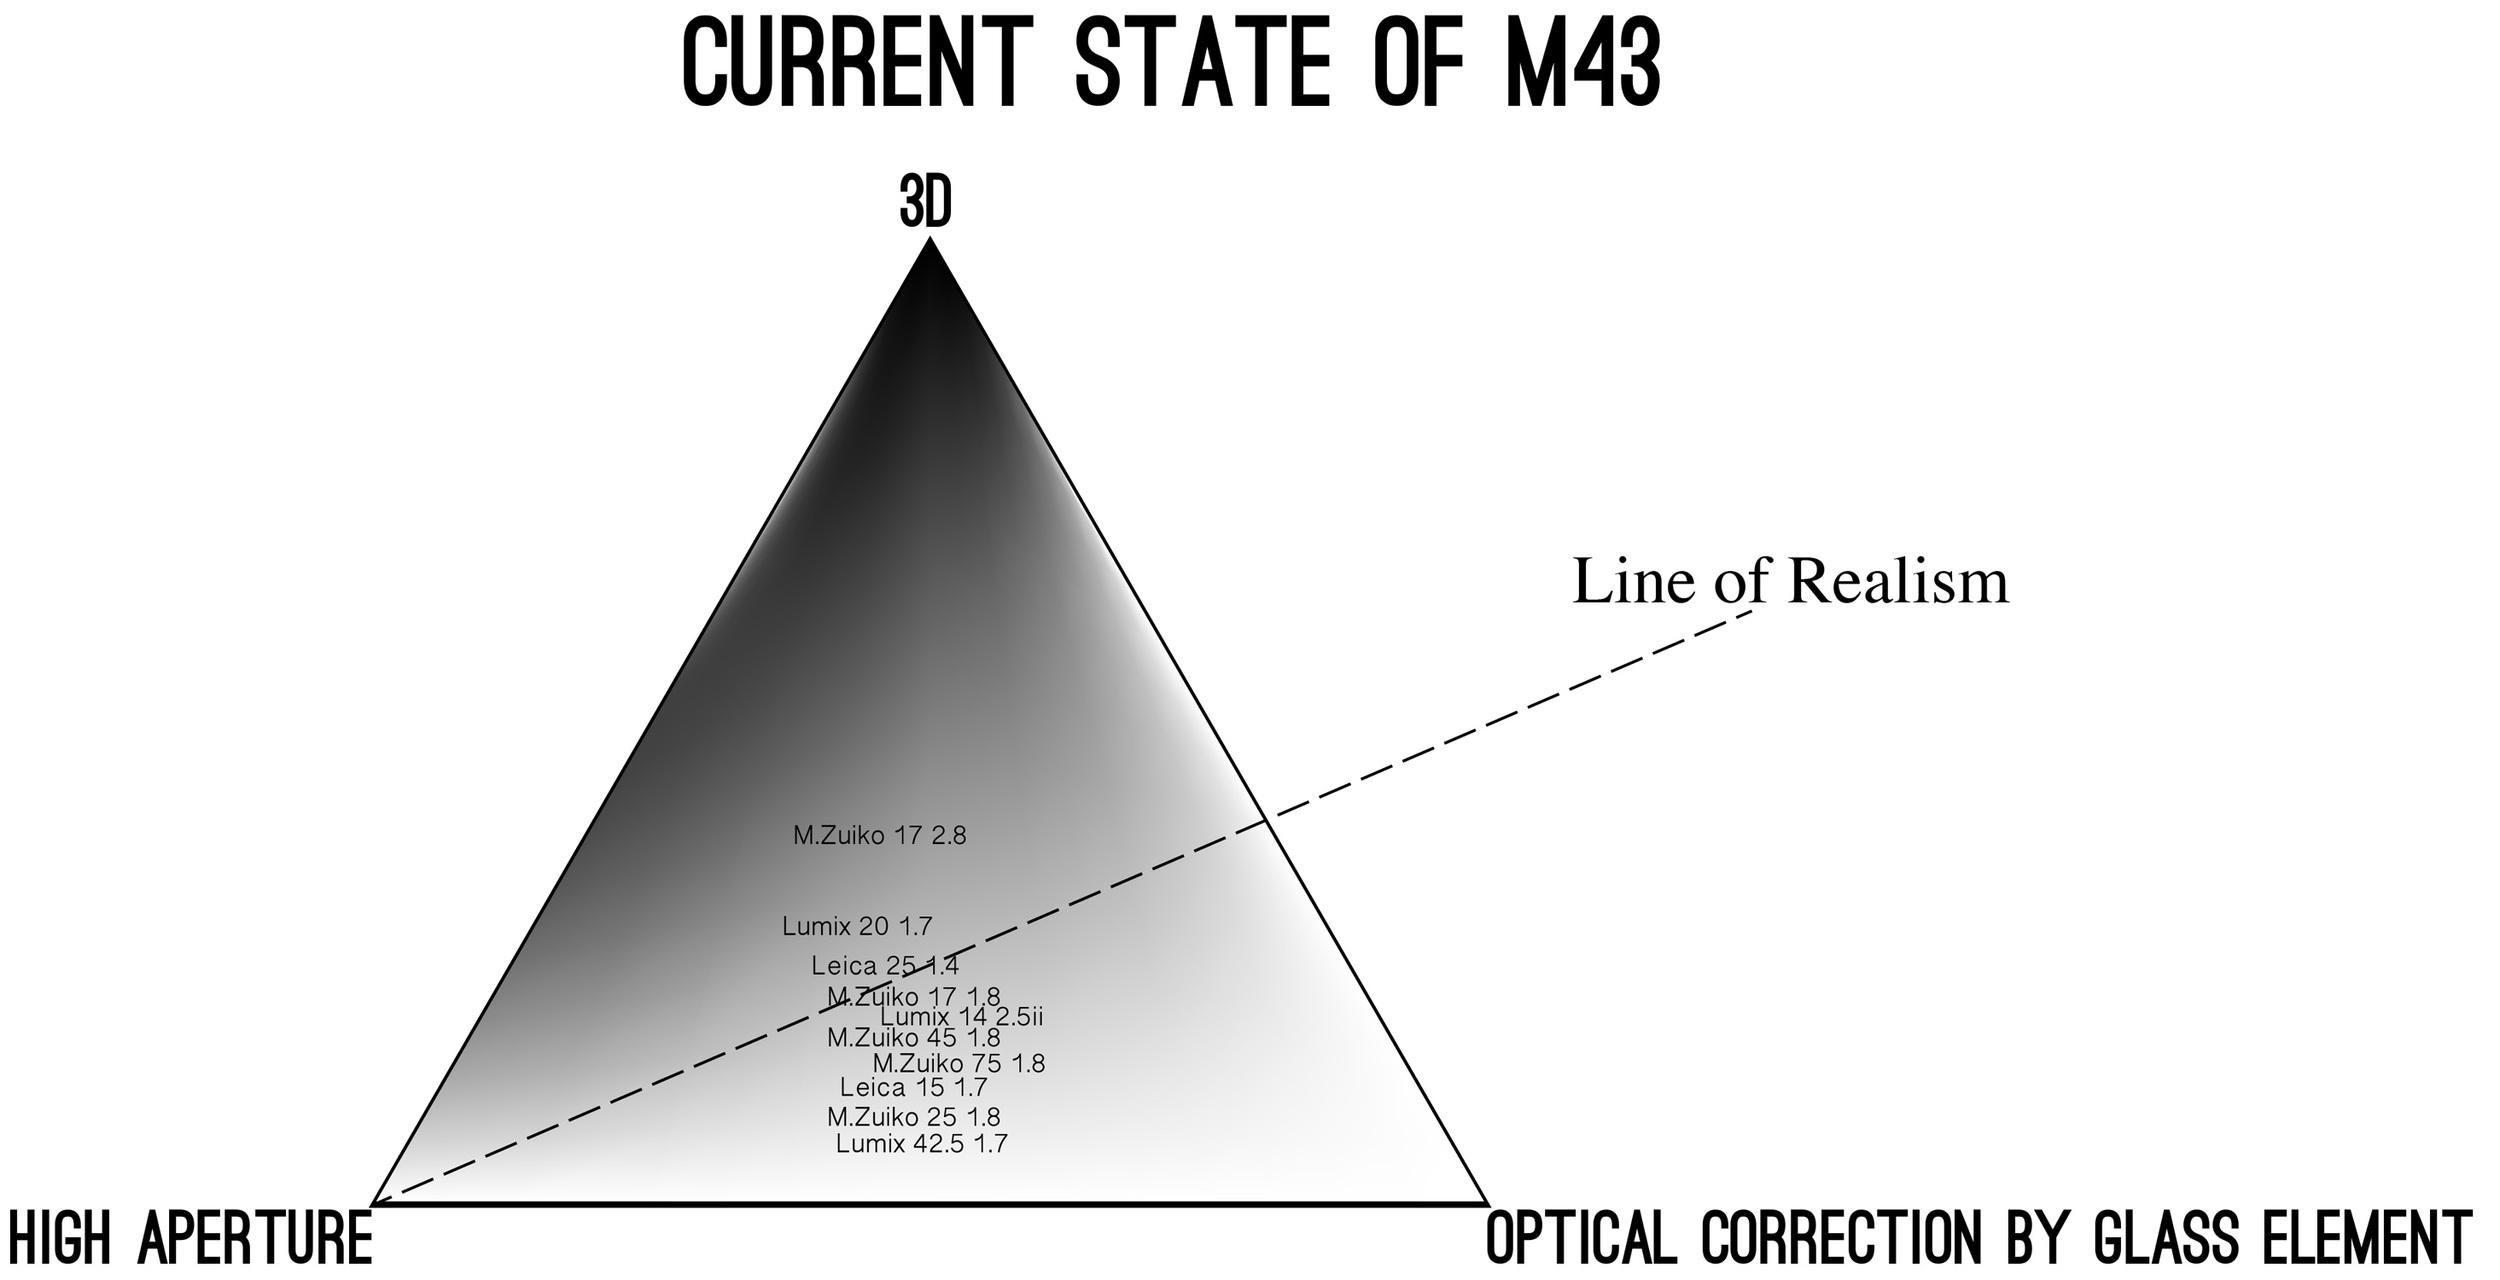 20160223-diagram-m43.jpg